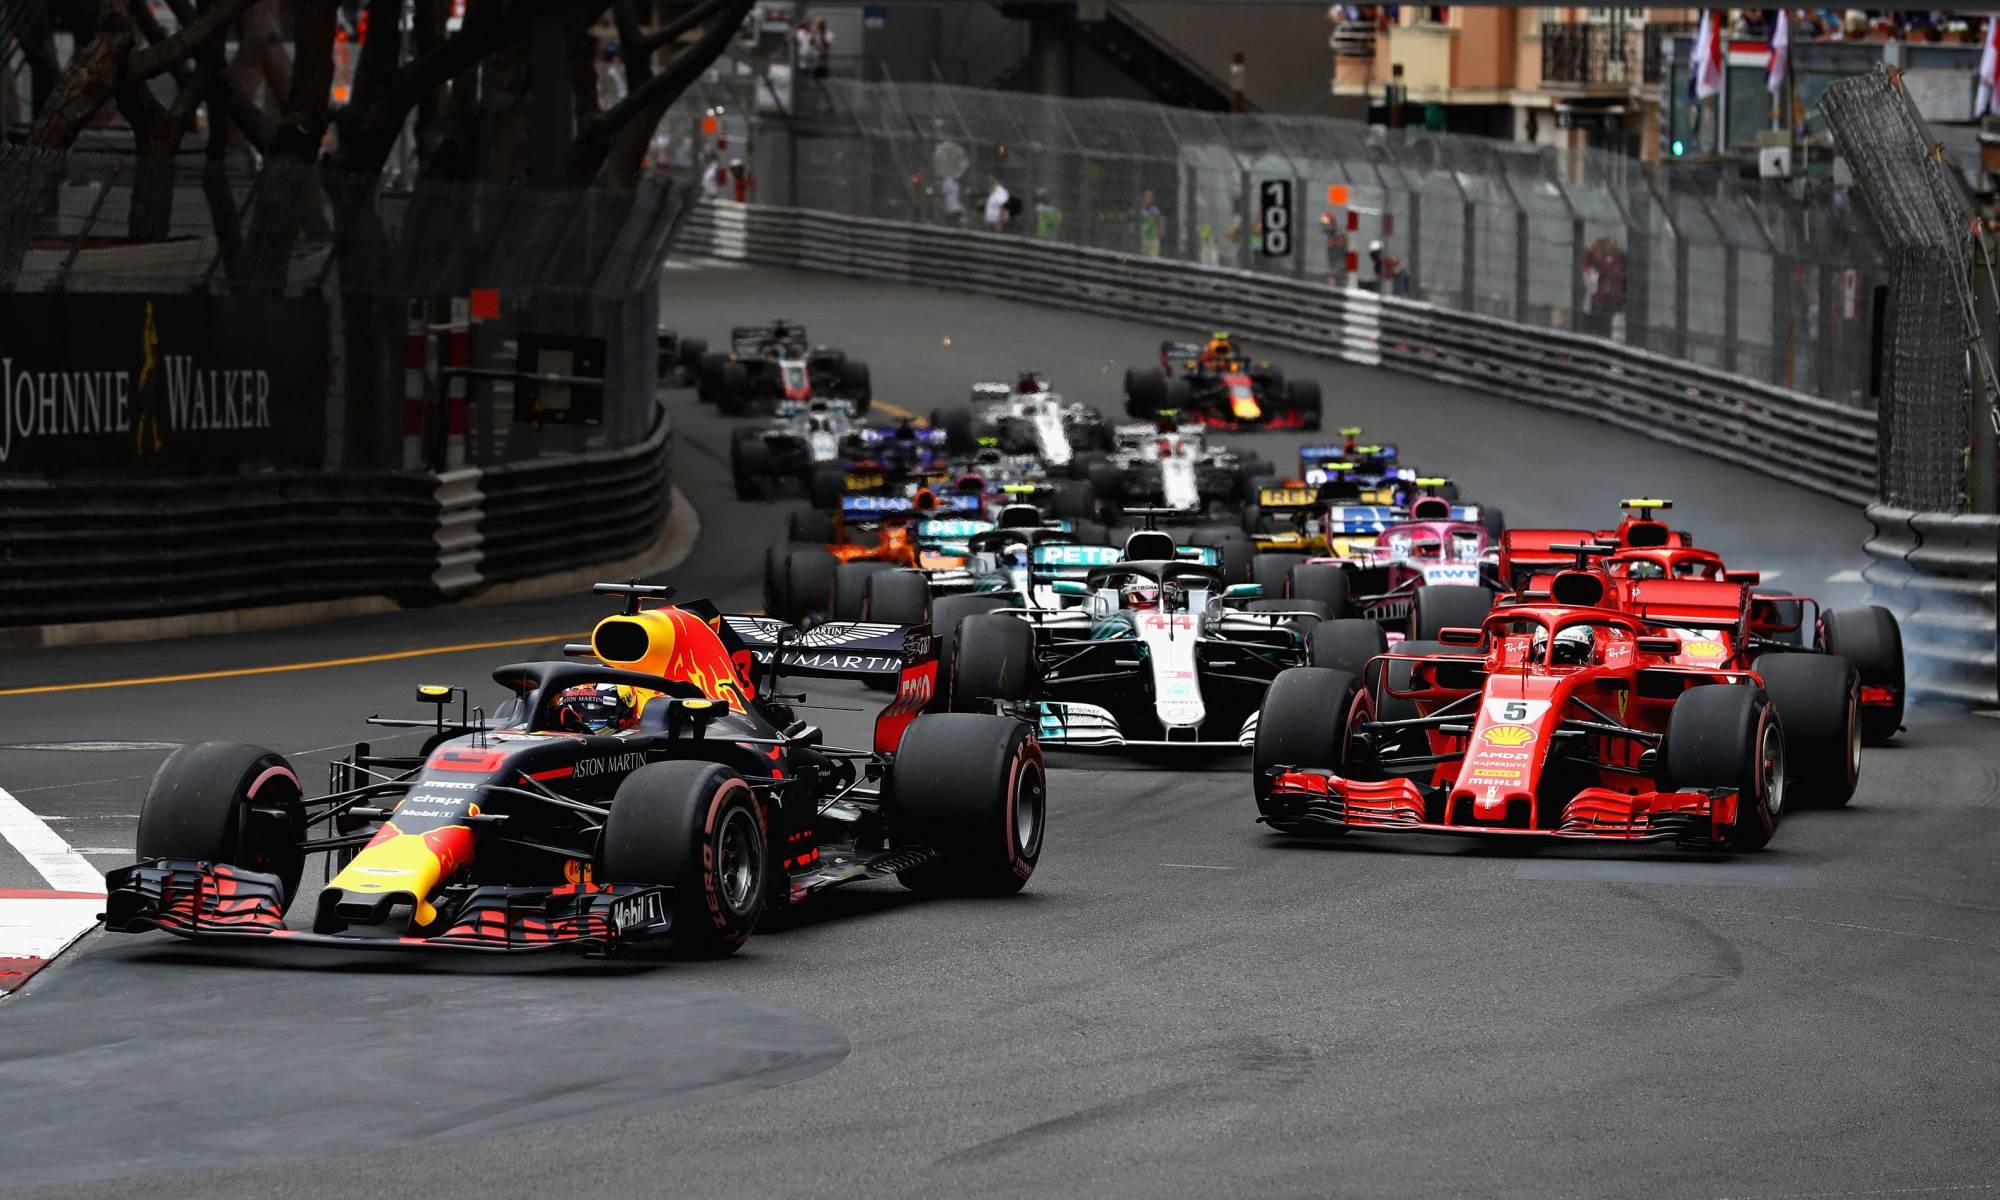 RBR driver Daniel Ricciardo lead from flag to flag